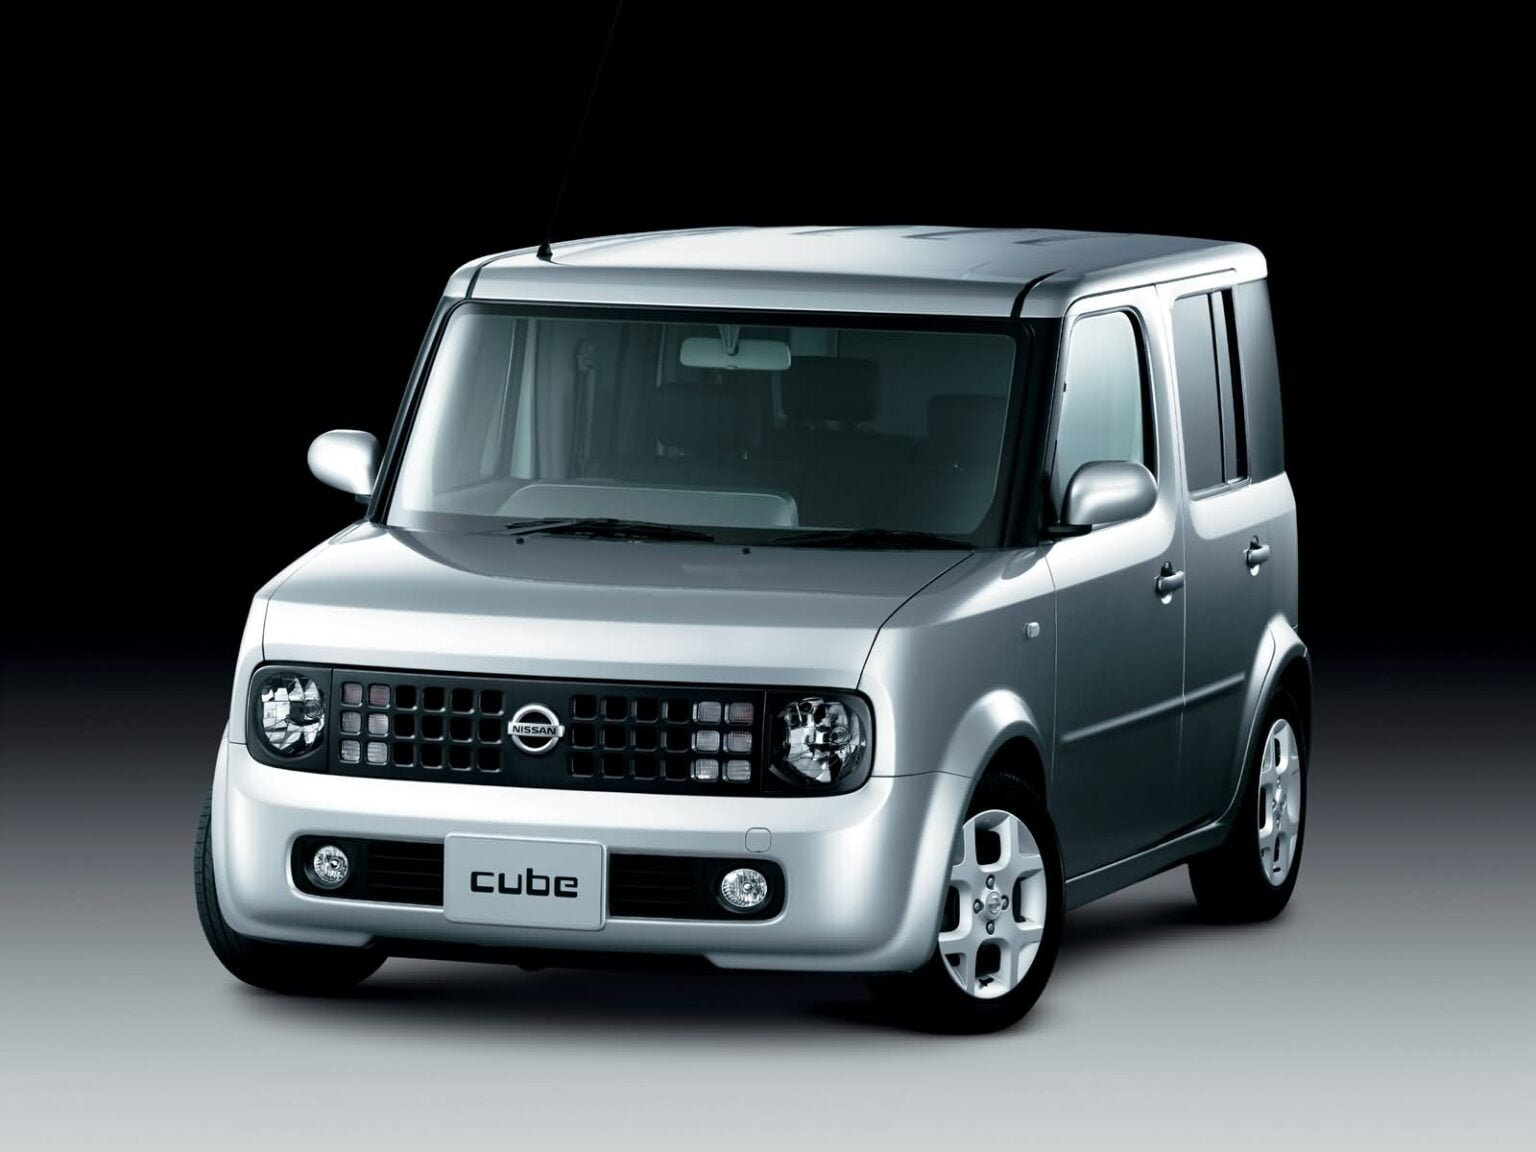 Cube2003